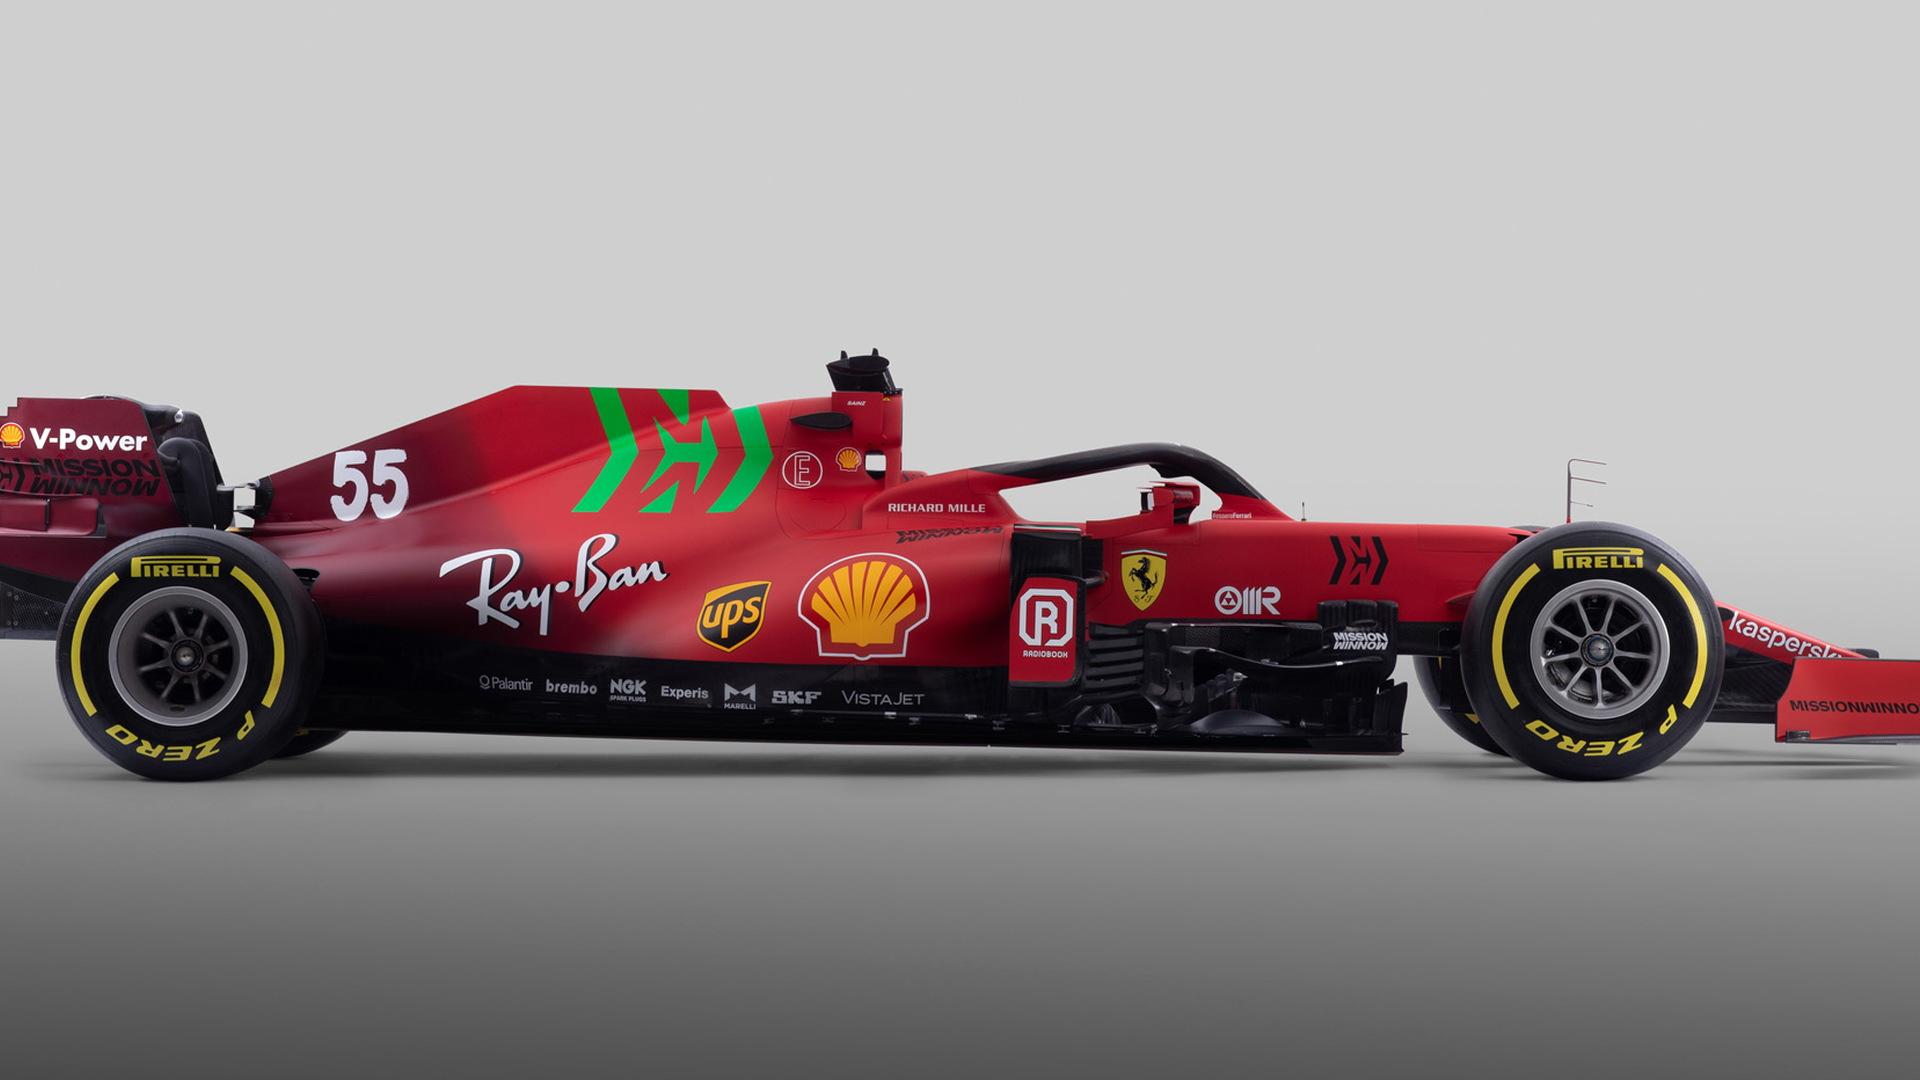 2021 Ferrari SF21 Formula One race car